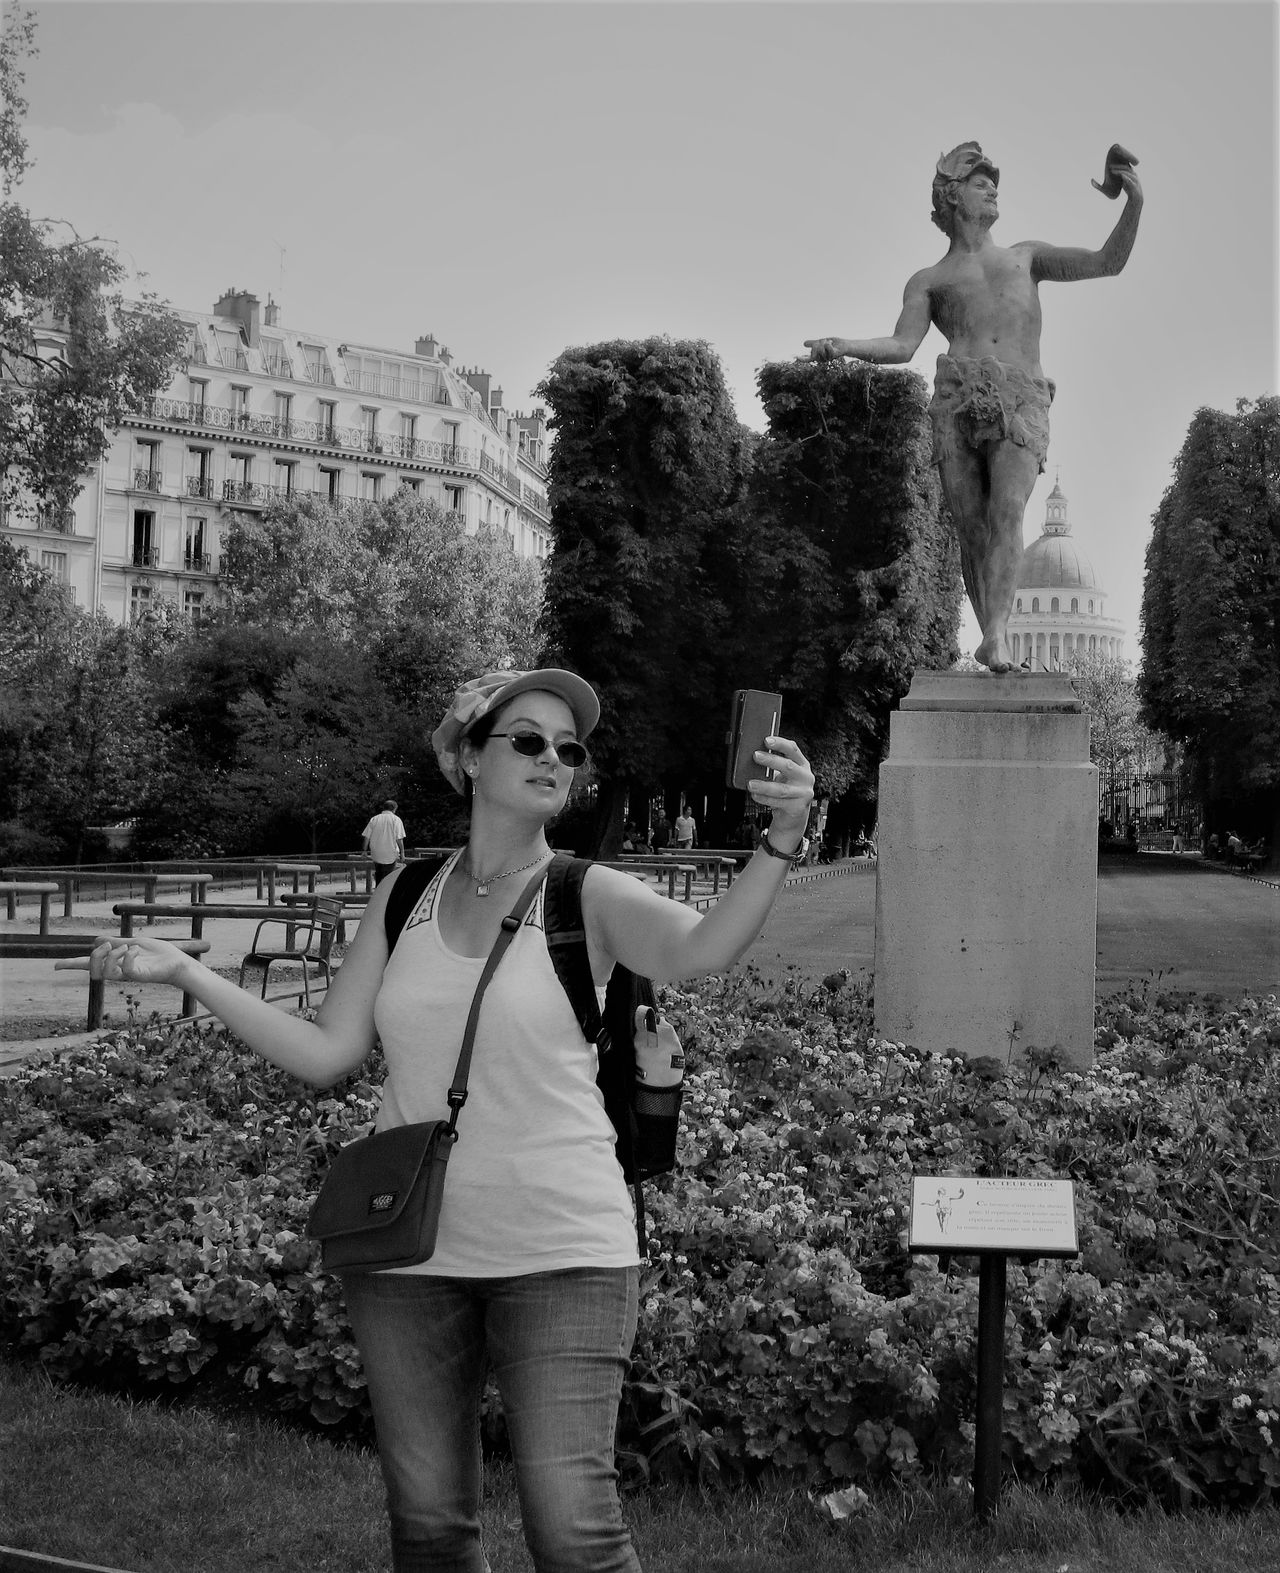 Tourist Selfie Adult Adults Only Black And White Comedy Funny Pics Jardin Du Luxembourg Jardin Du Luxembourg, Paris Outdoors Selfie Tourist Taking Selfies Selfie Culture Selfie Fun The Week On EyeEm Neighborhood Map